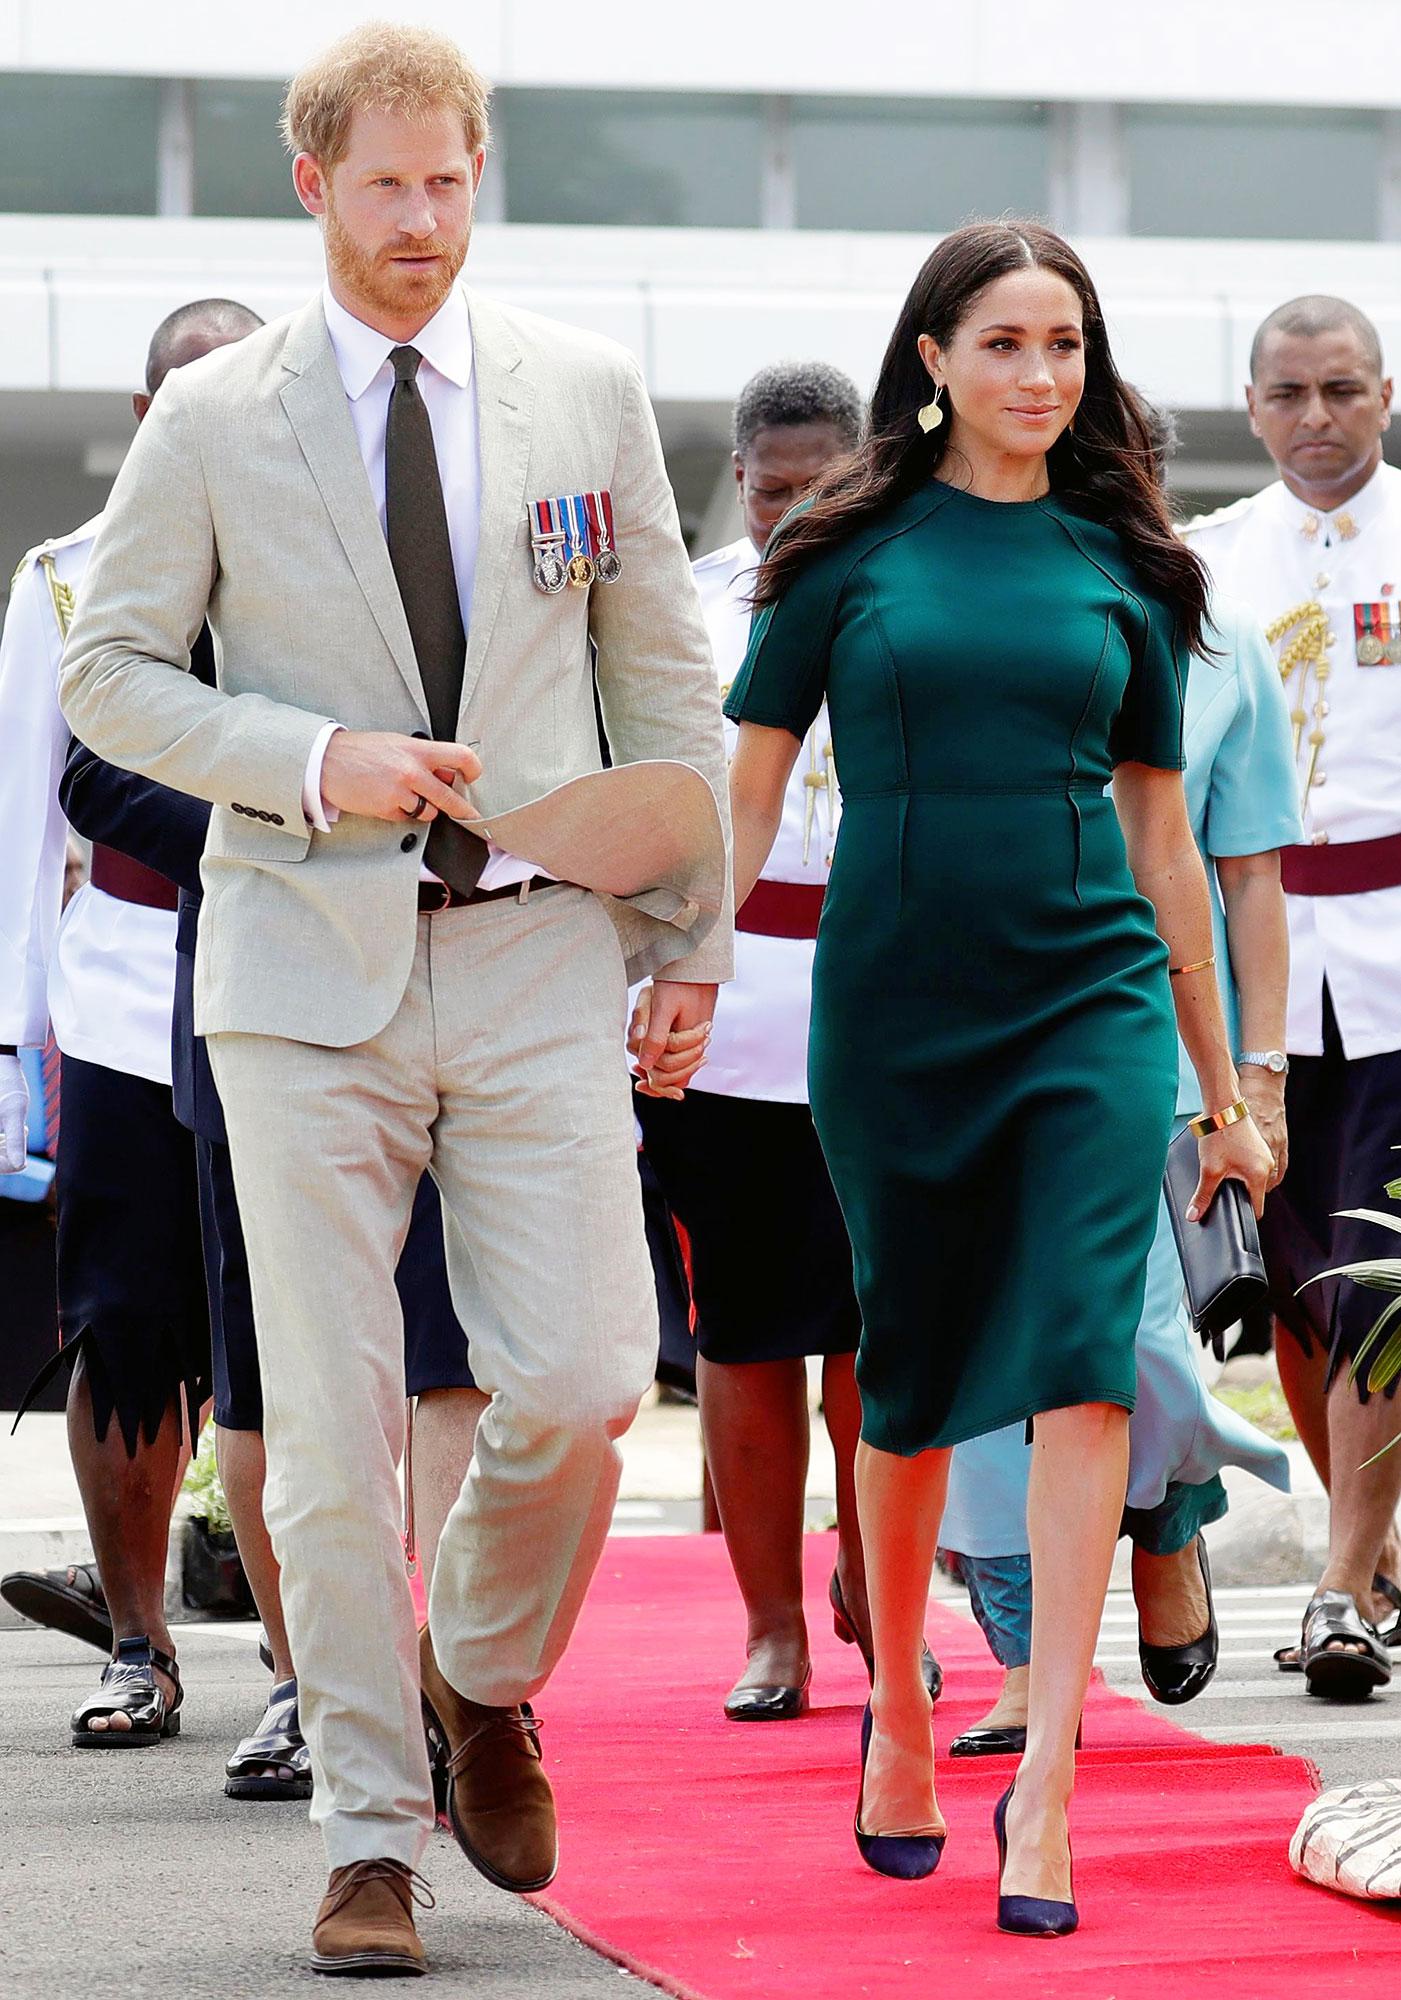 Prince Harry and Duchess Meghan Arrive in Fiji Prince Harry and Duchess Meghan Are Confident After Royal Step Back